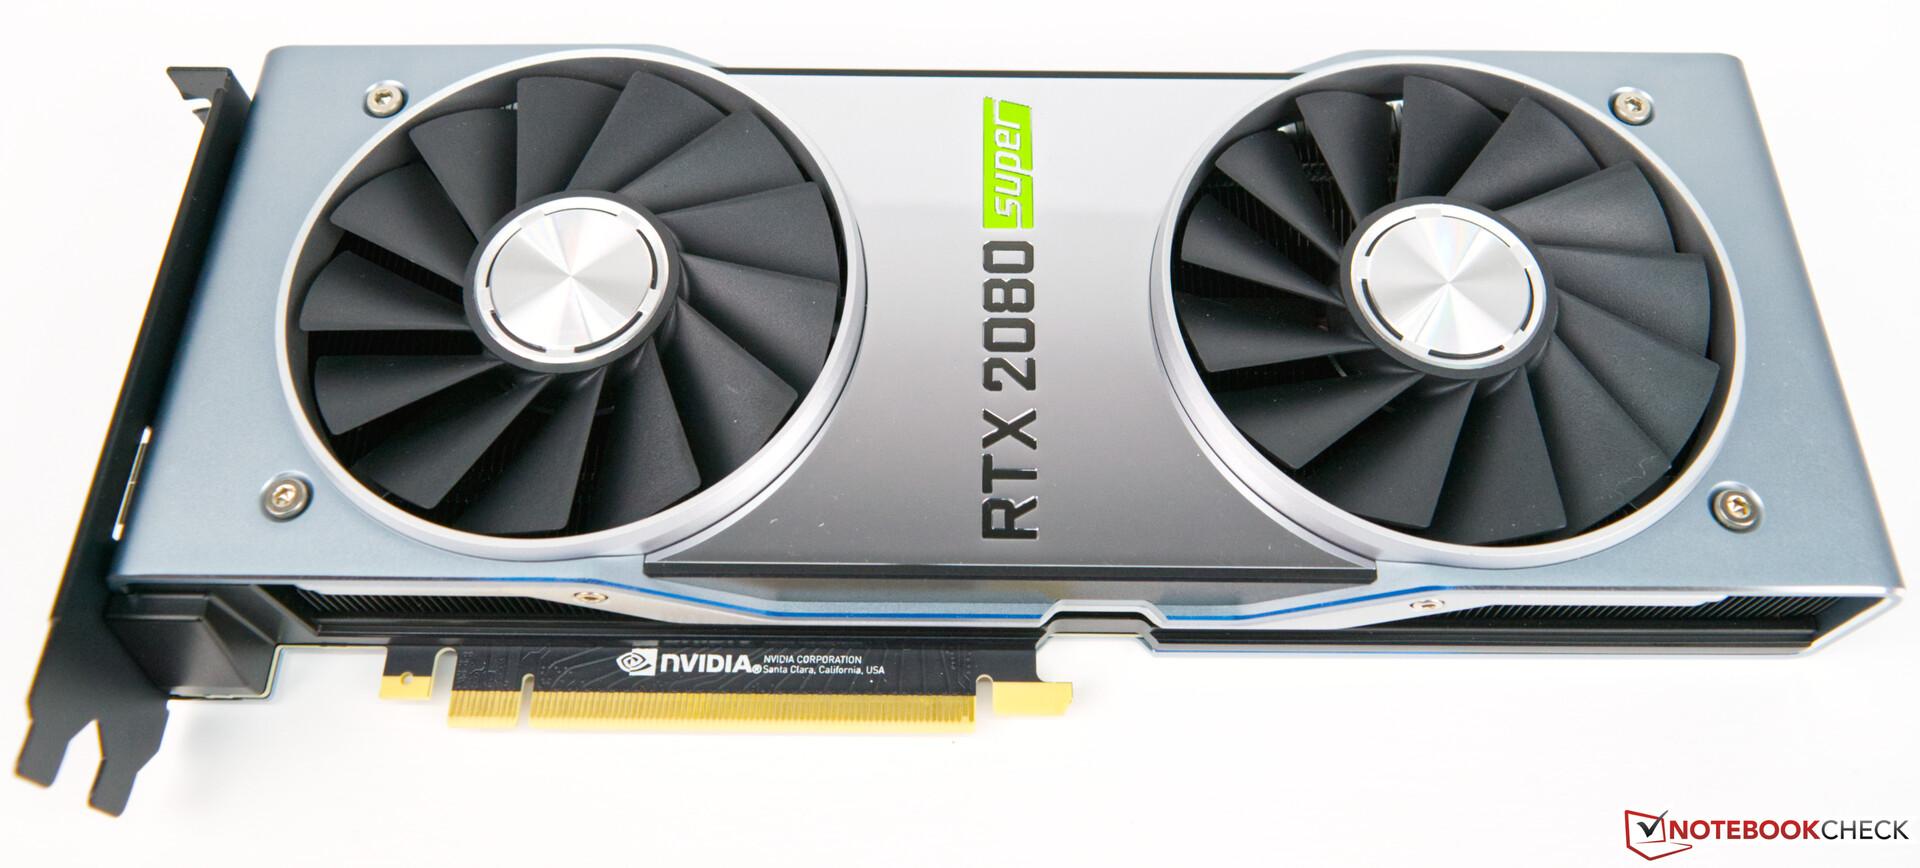 NVIDIA RTX 2080 SUPER Desktop GPU Review: A high-end Desktop